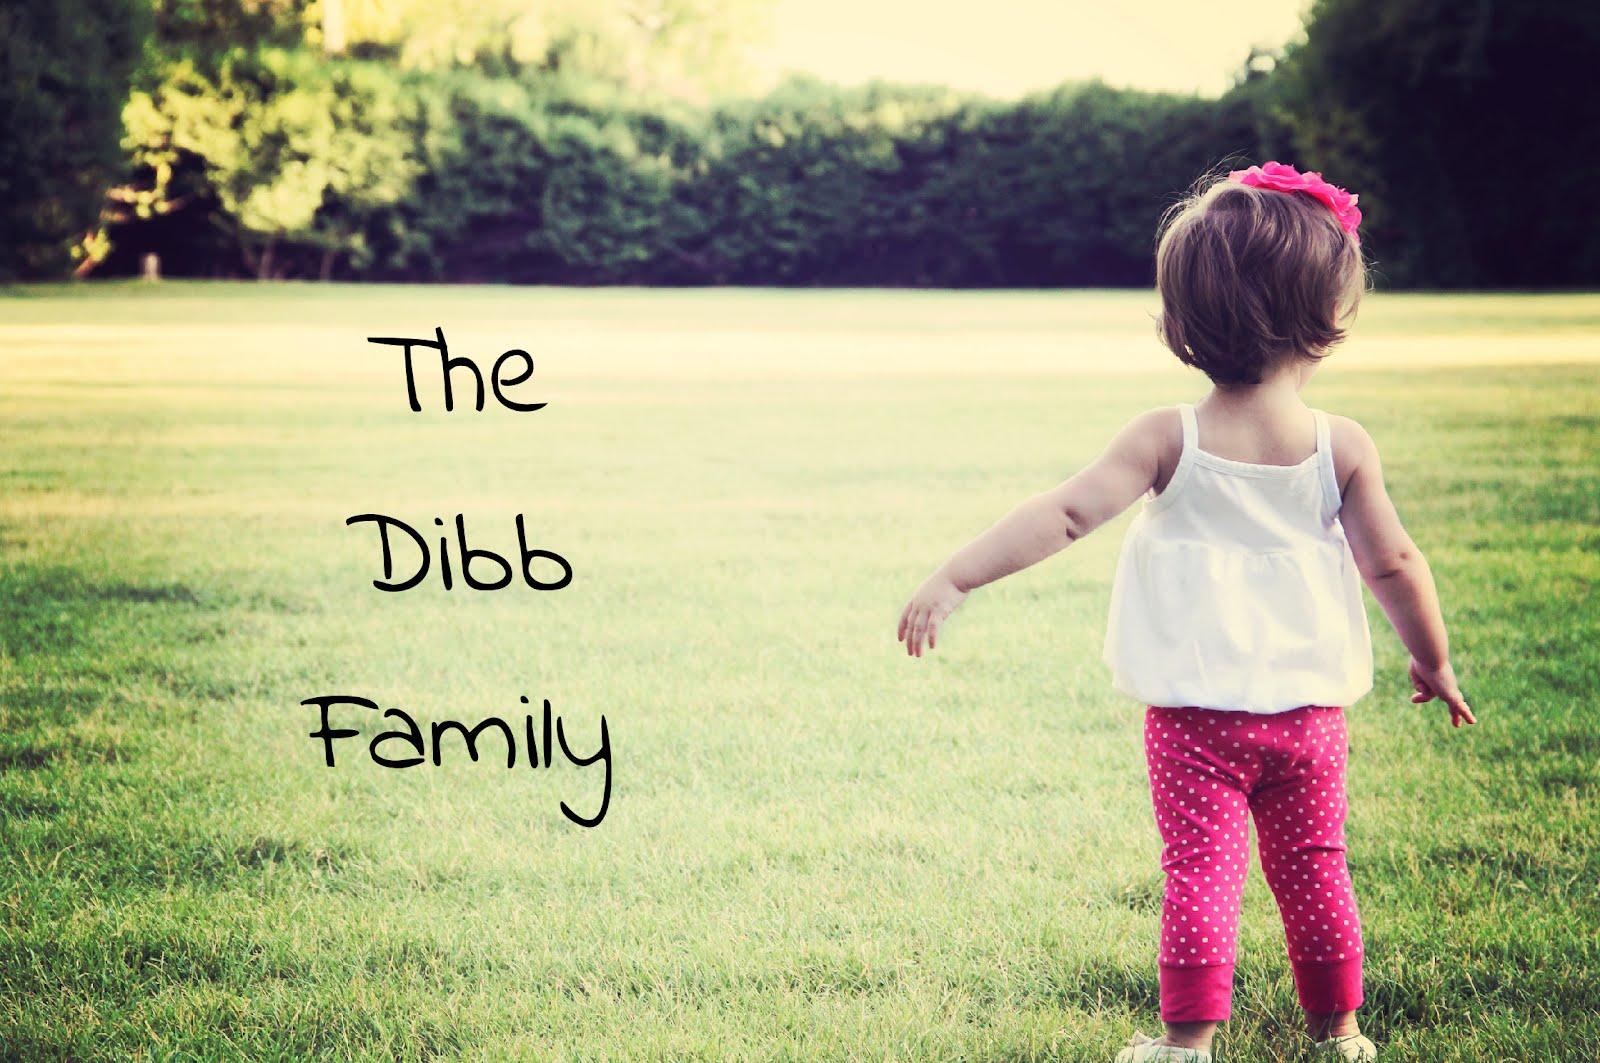 Dibb and Britt